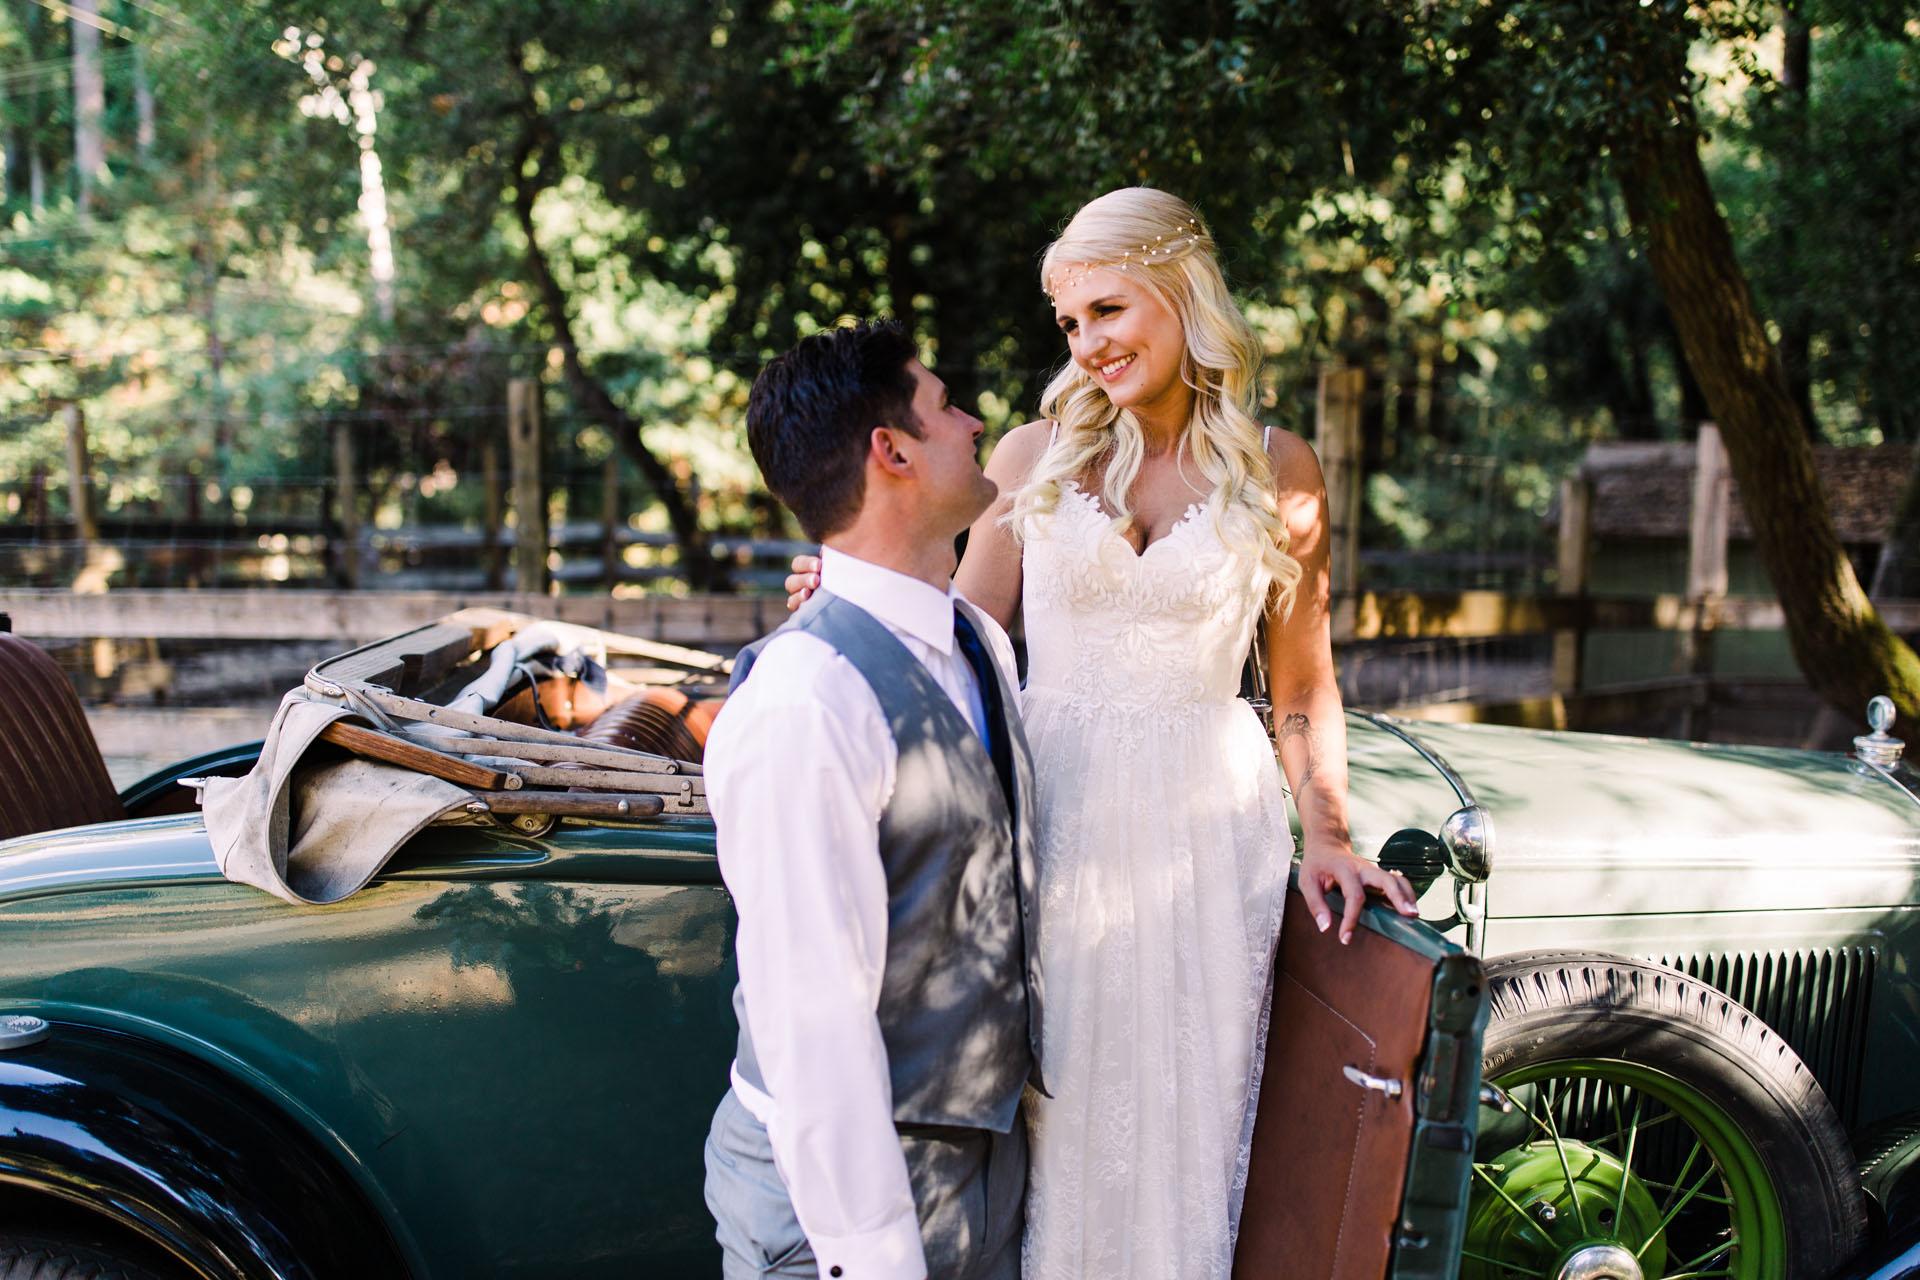 10-7-17 Devon and Jordan's Wedding-118.jpg